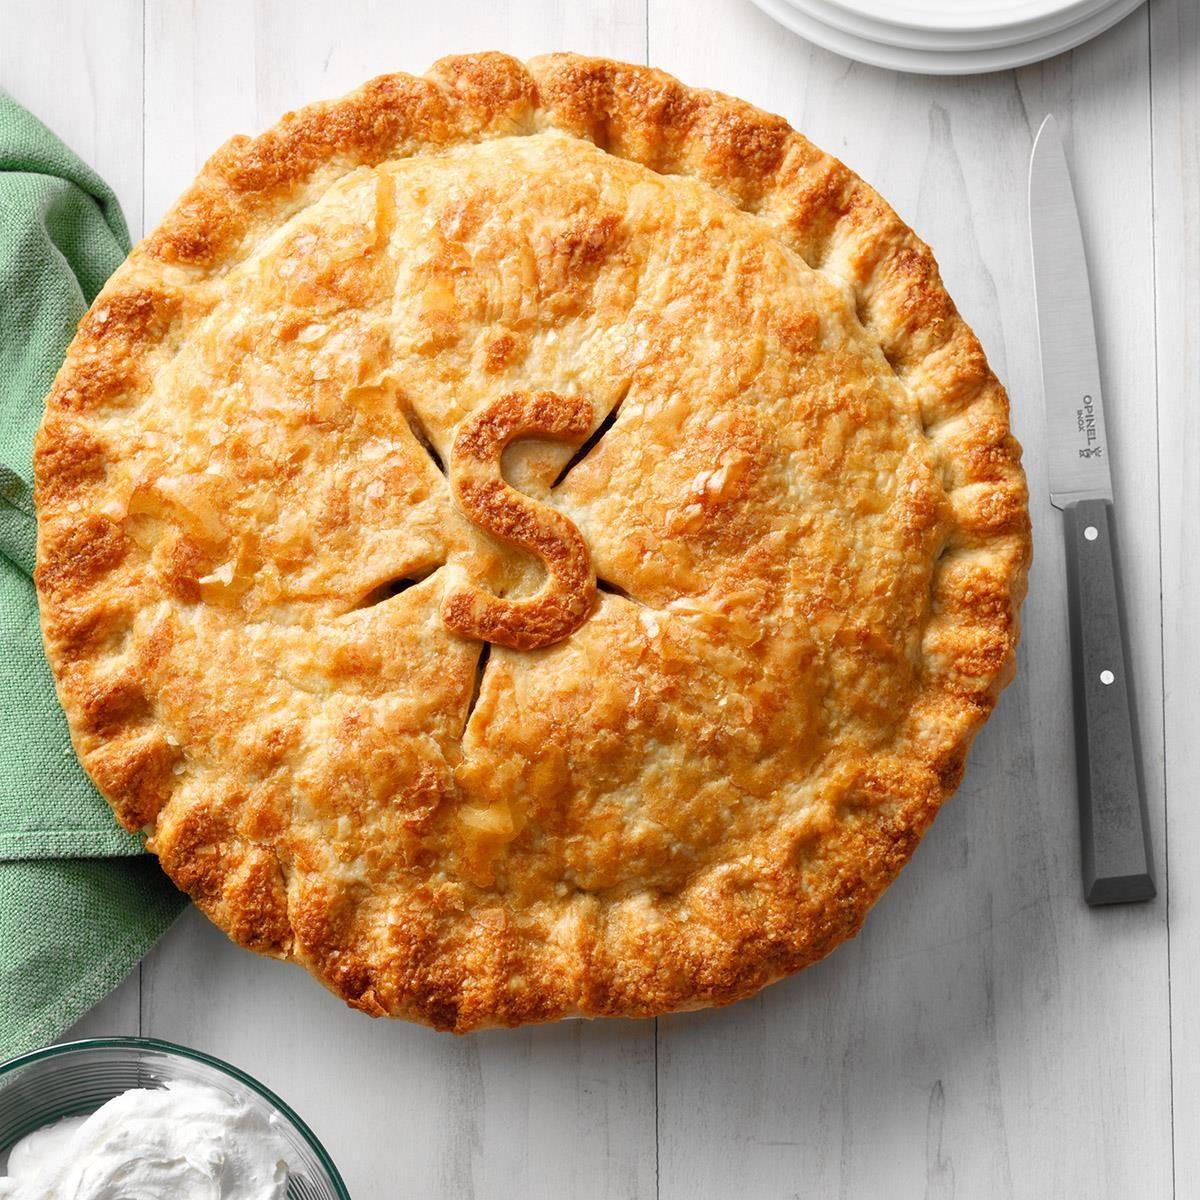 Maple-Glazed Apple Pie Recipe